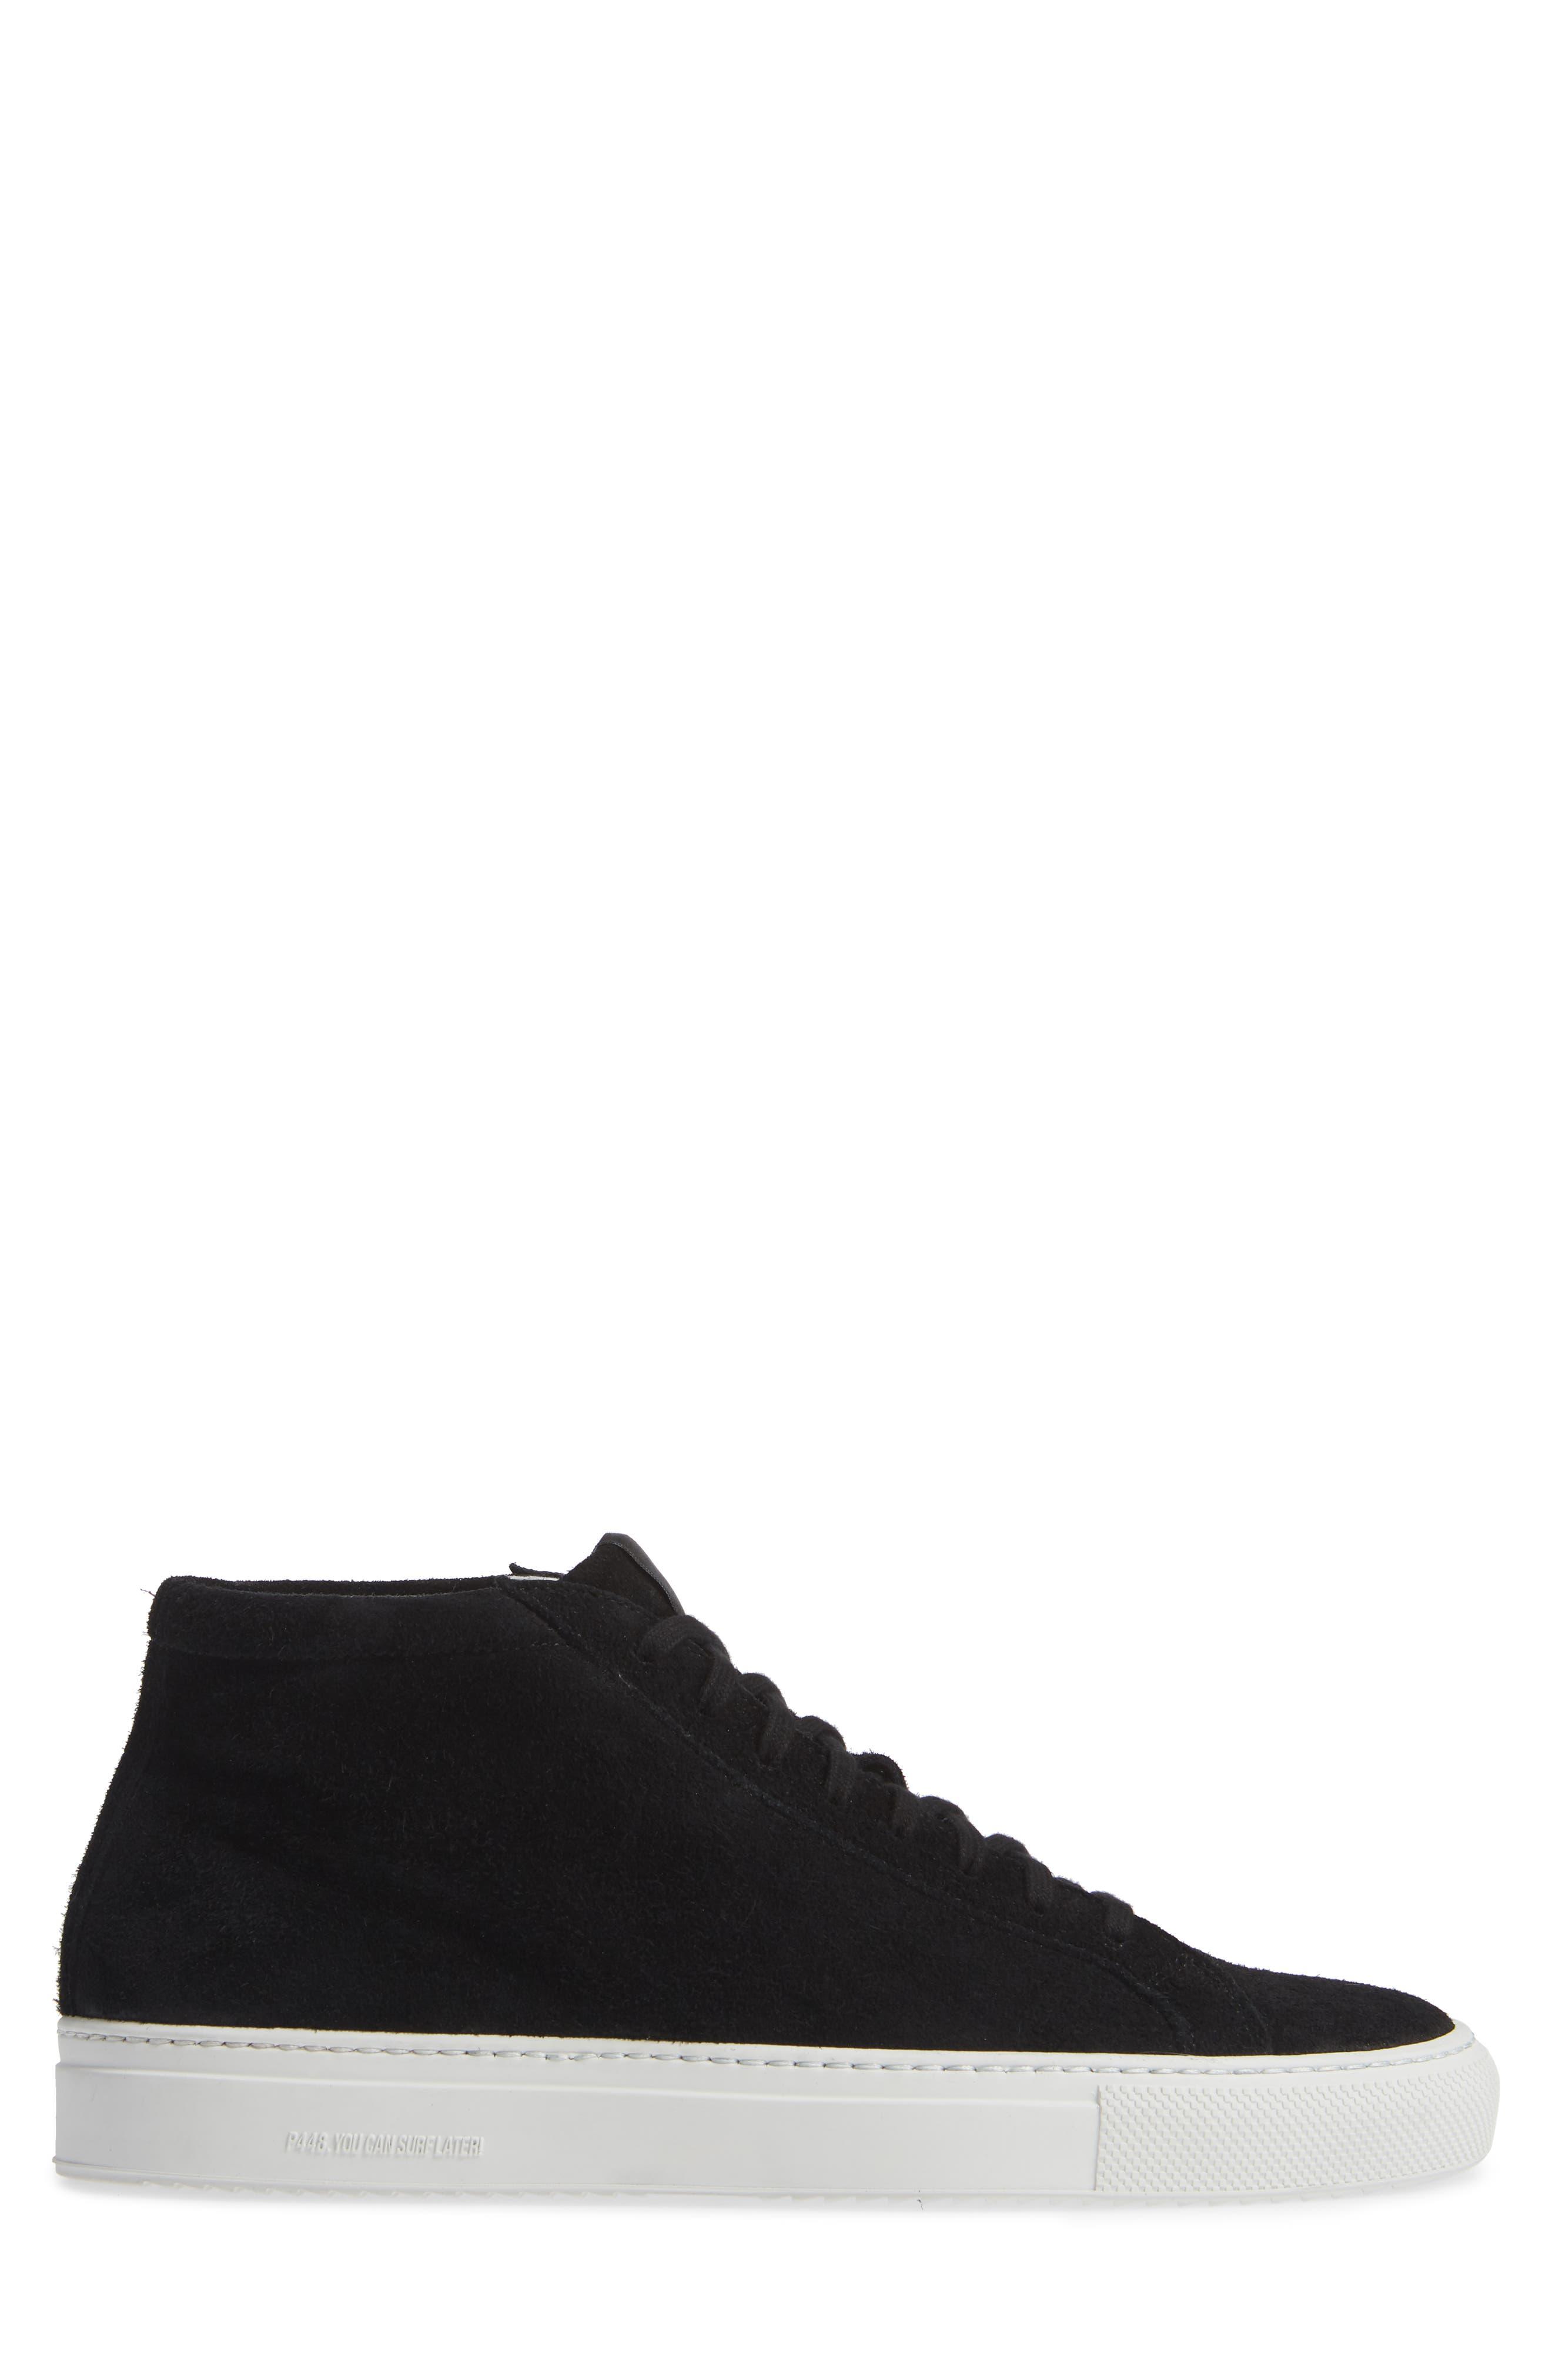 A8Elevent Mid Sneaker,                             Alternate thumbnail 3, color,                             BLACK BRUSH